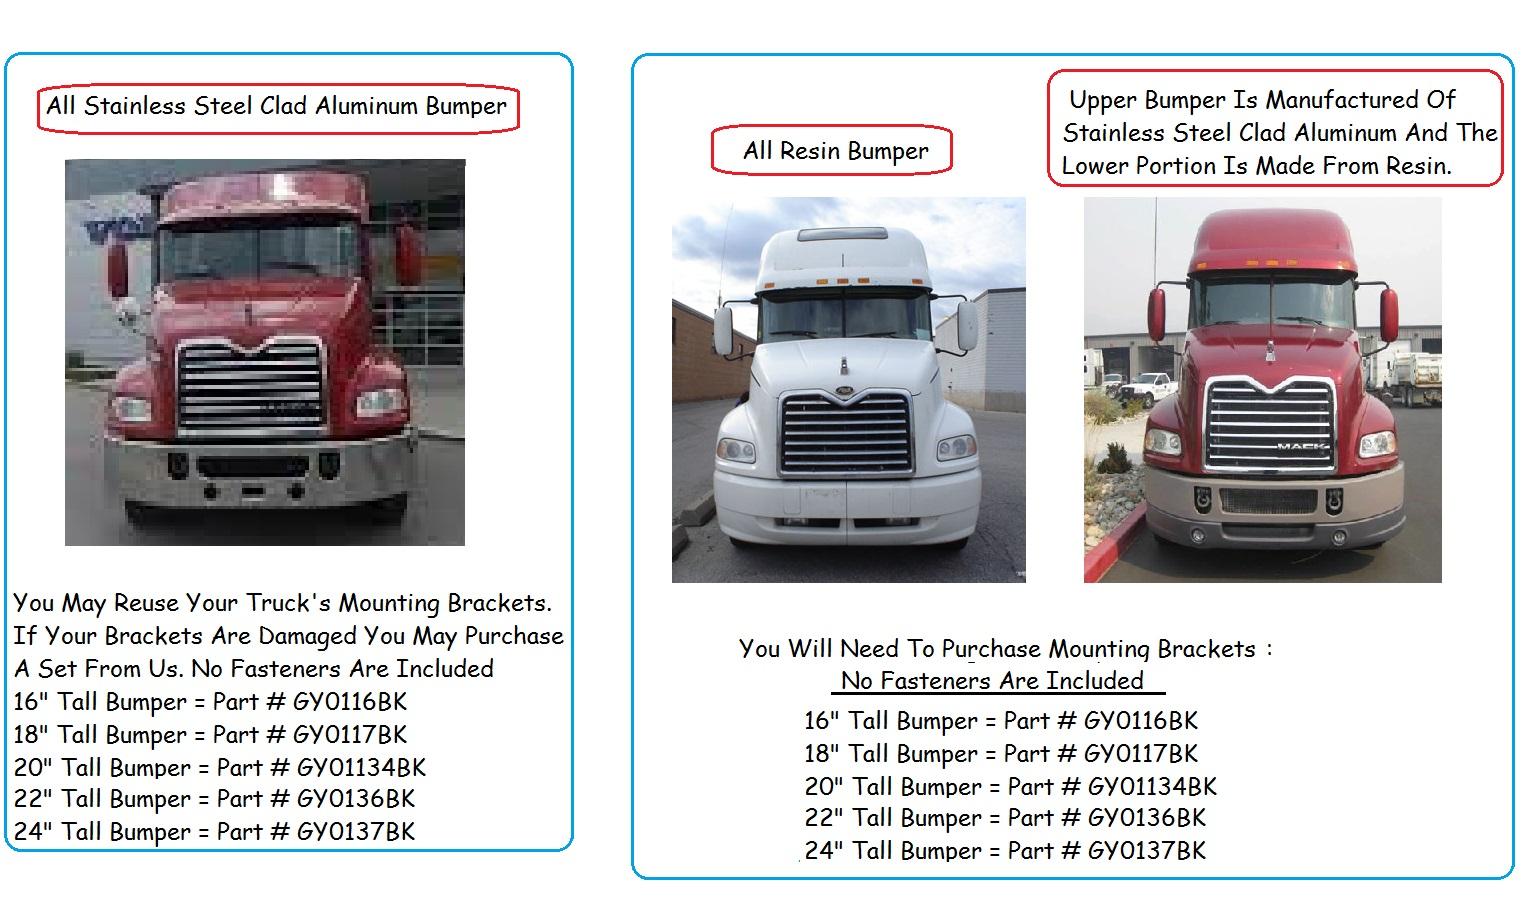 BumperMaker: Mack Pinnacle CXU613 Set Back Axle 2008 To 2015 on